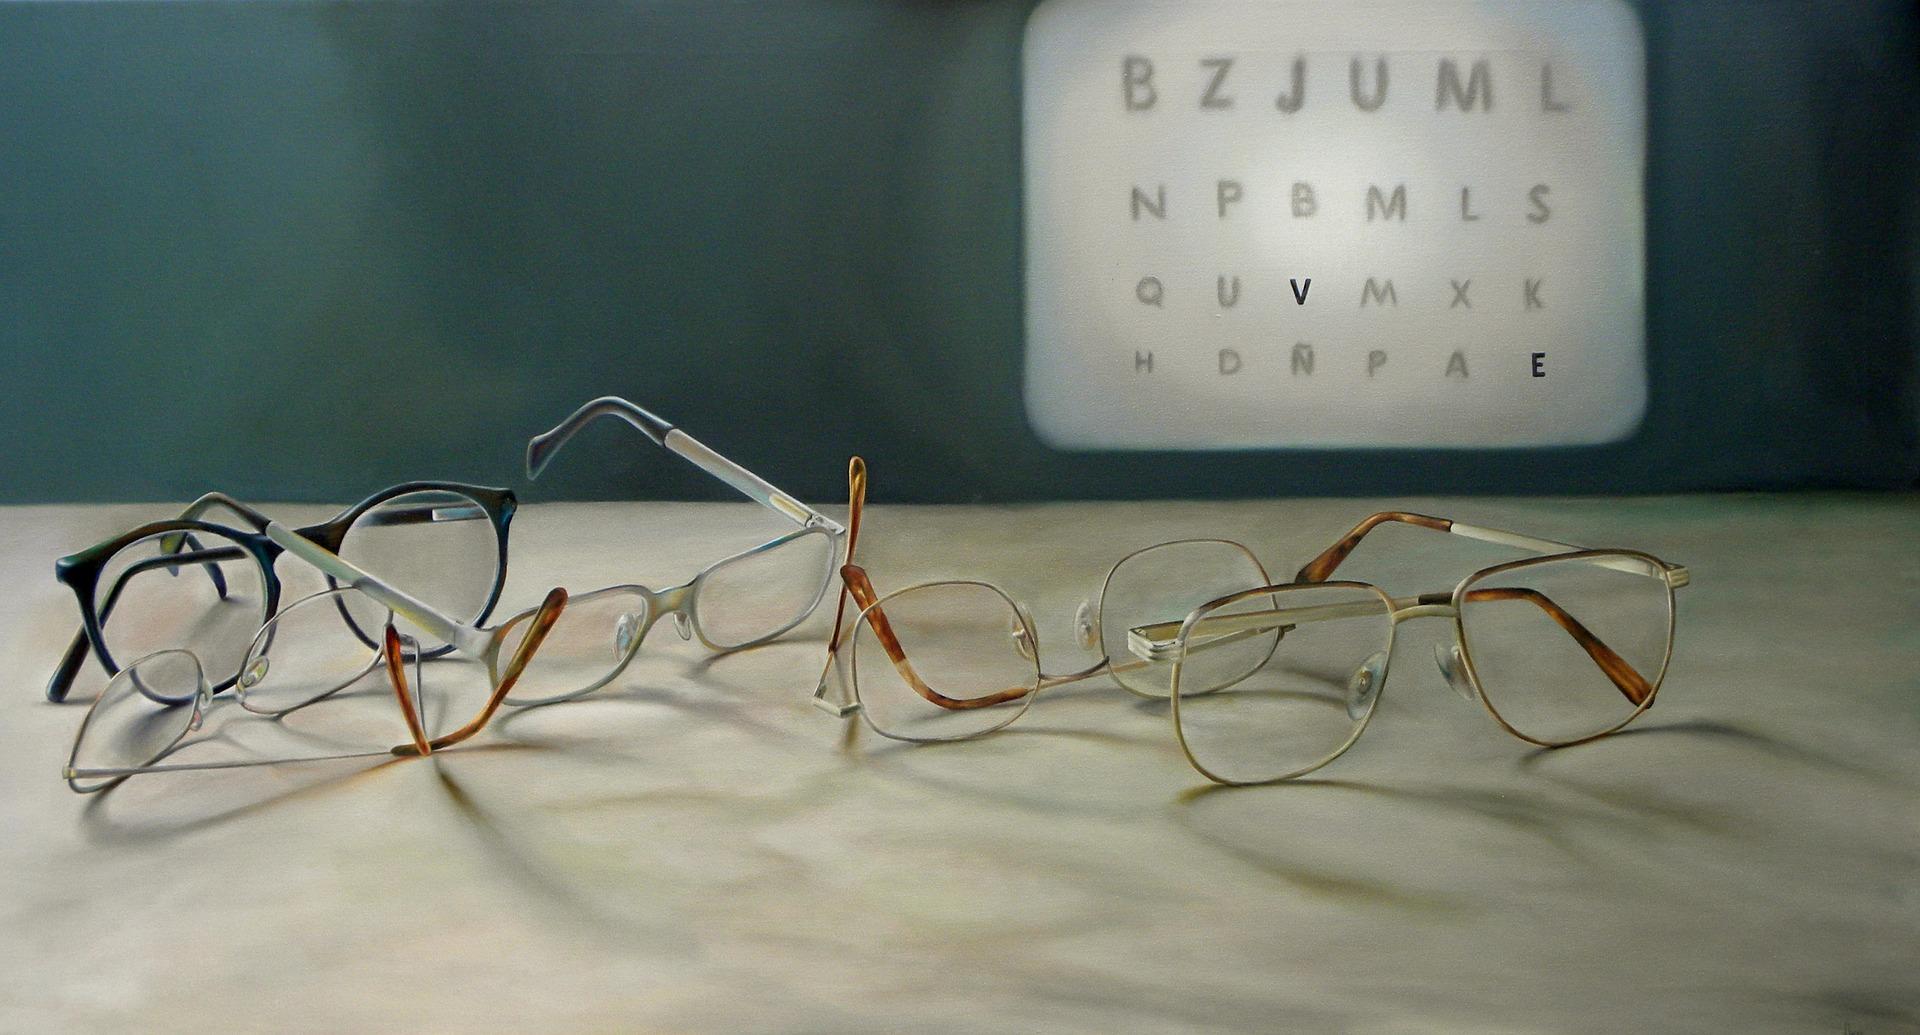 Różne okulary